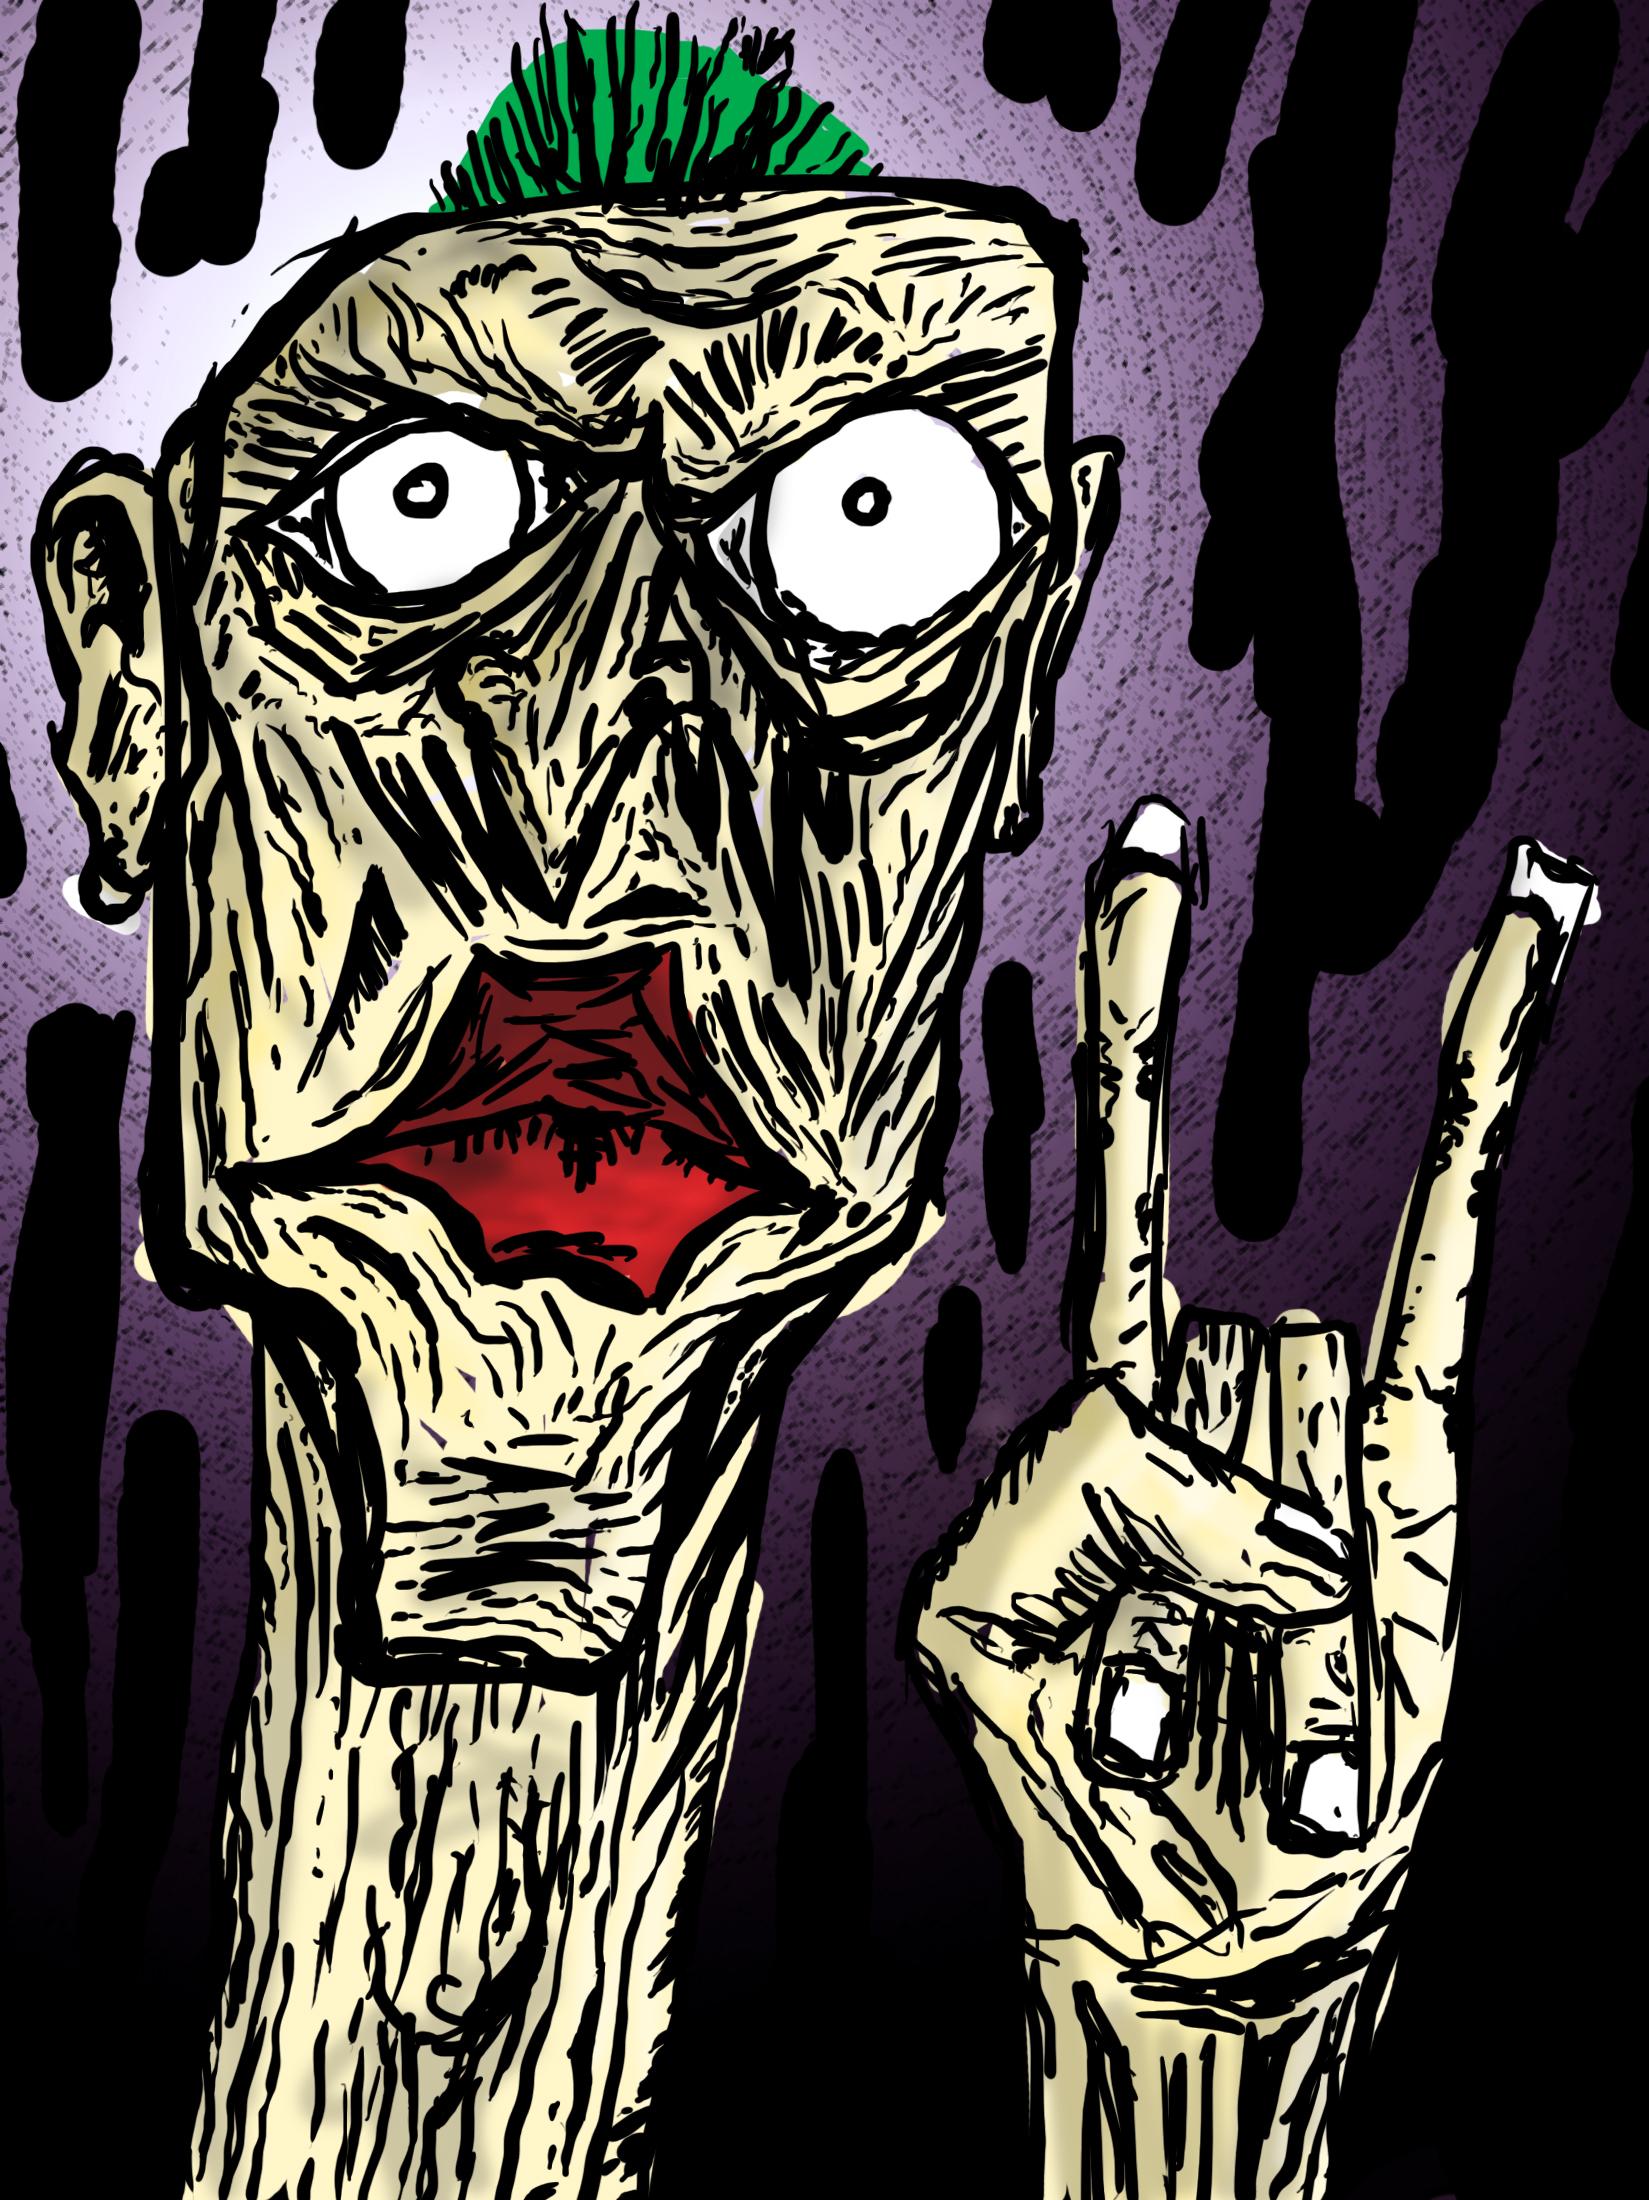 punk rock duude